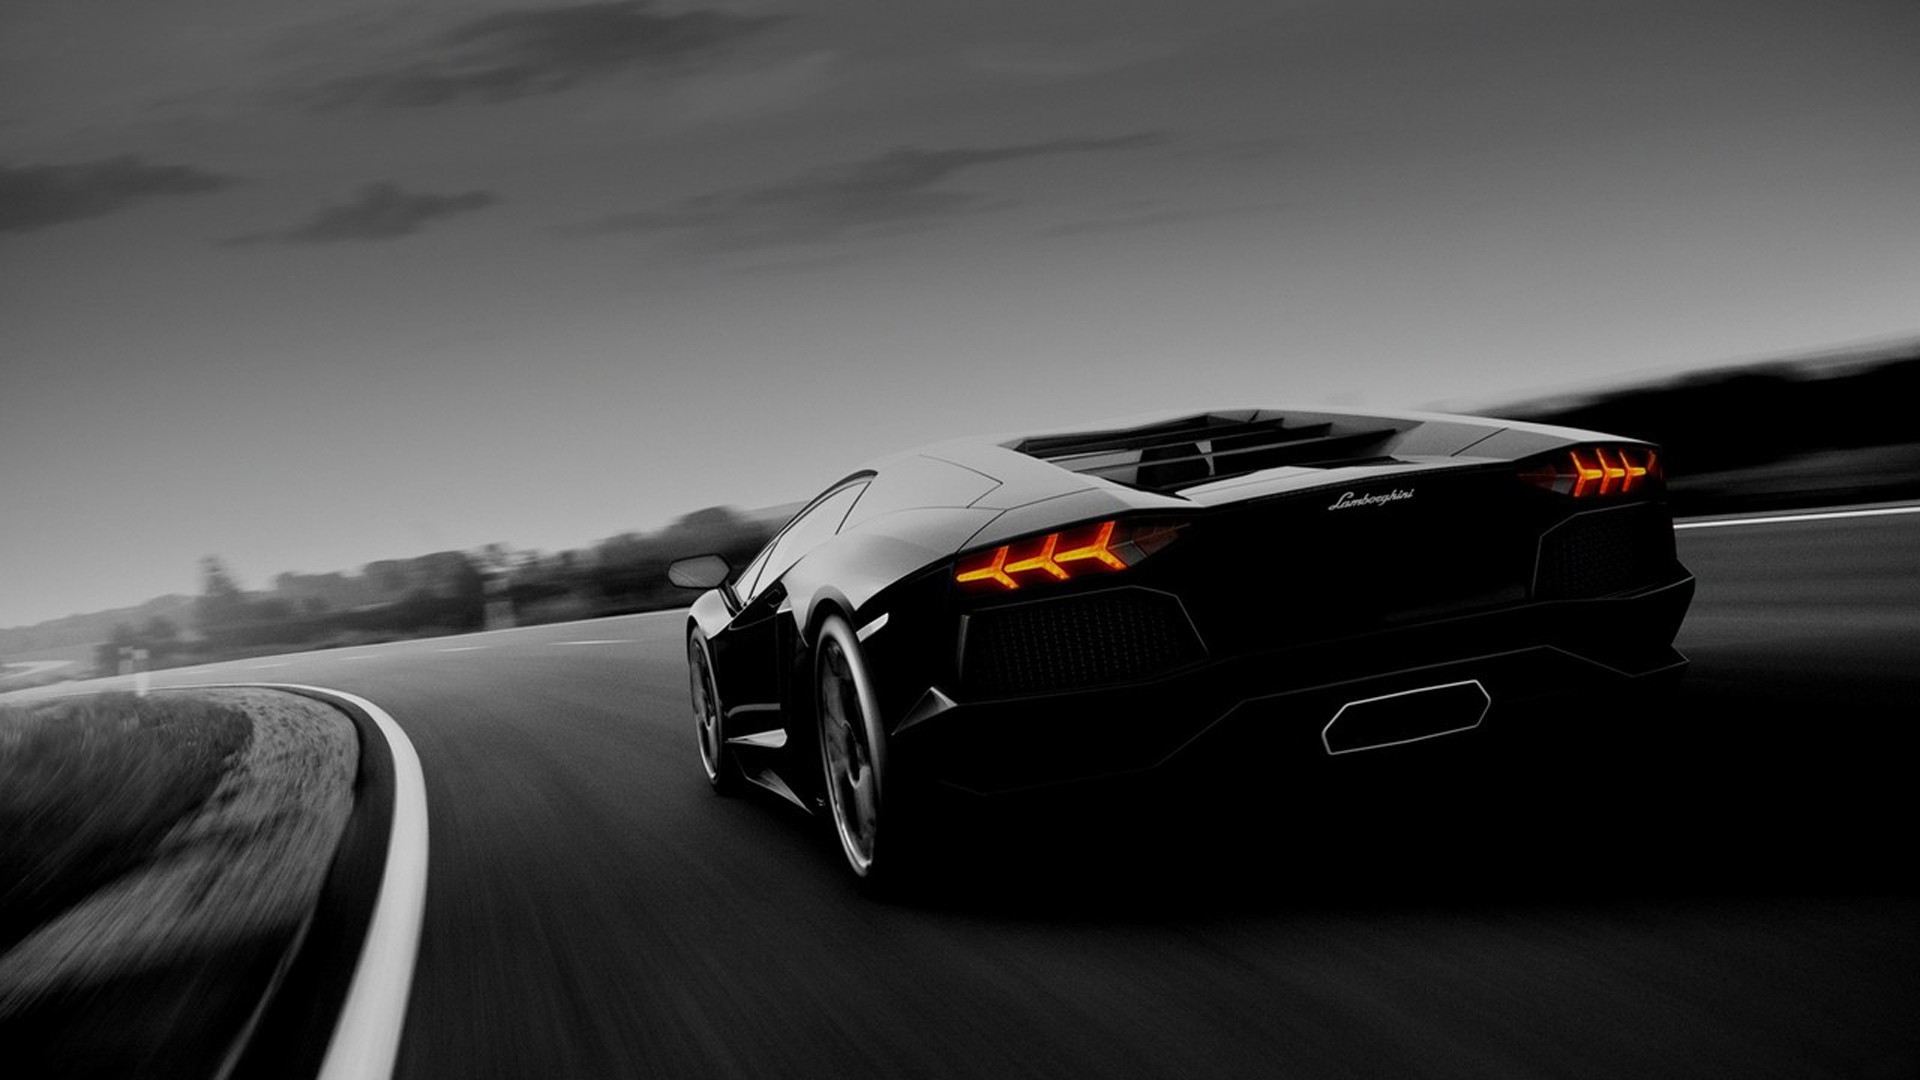 Lamborghini mursielago audi загрузить